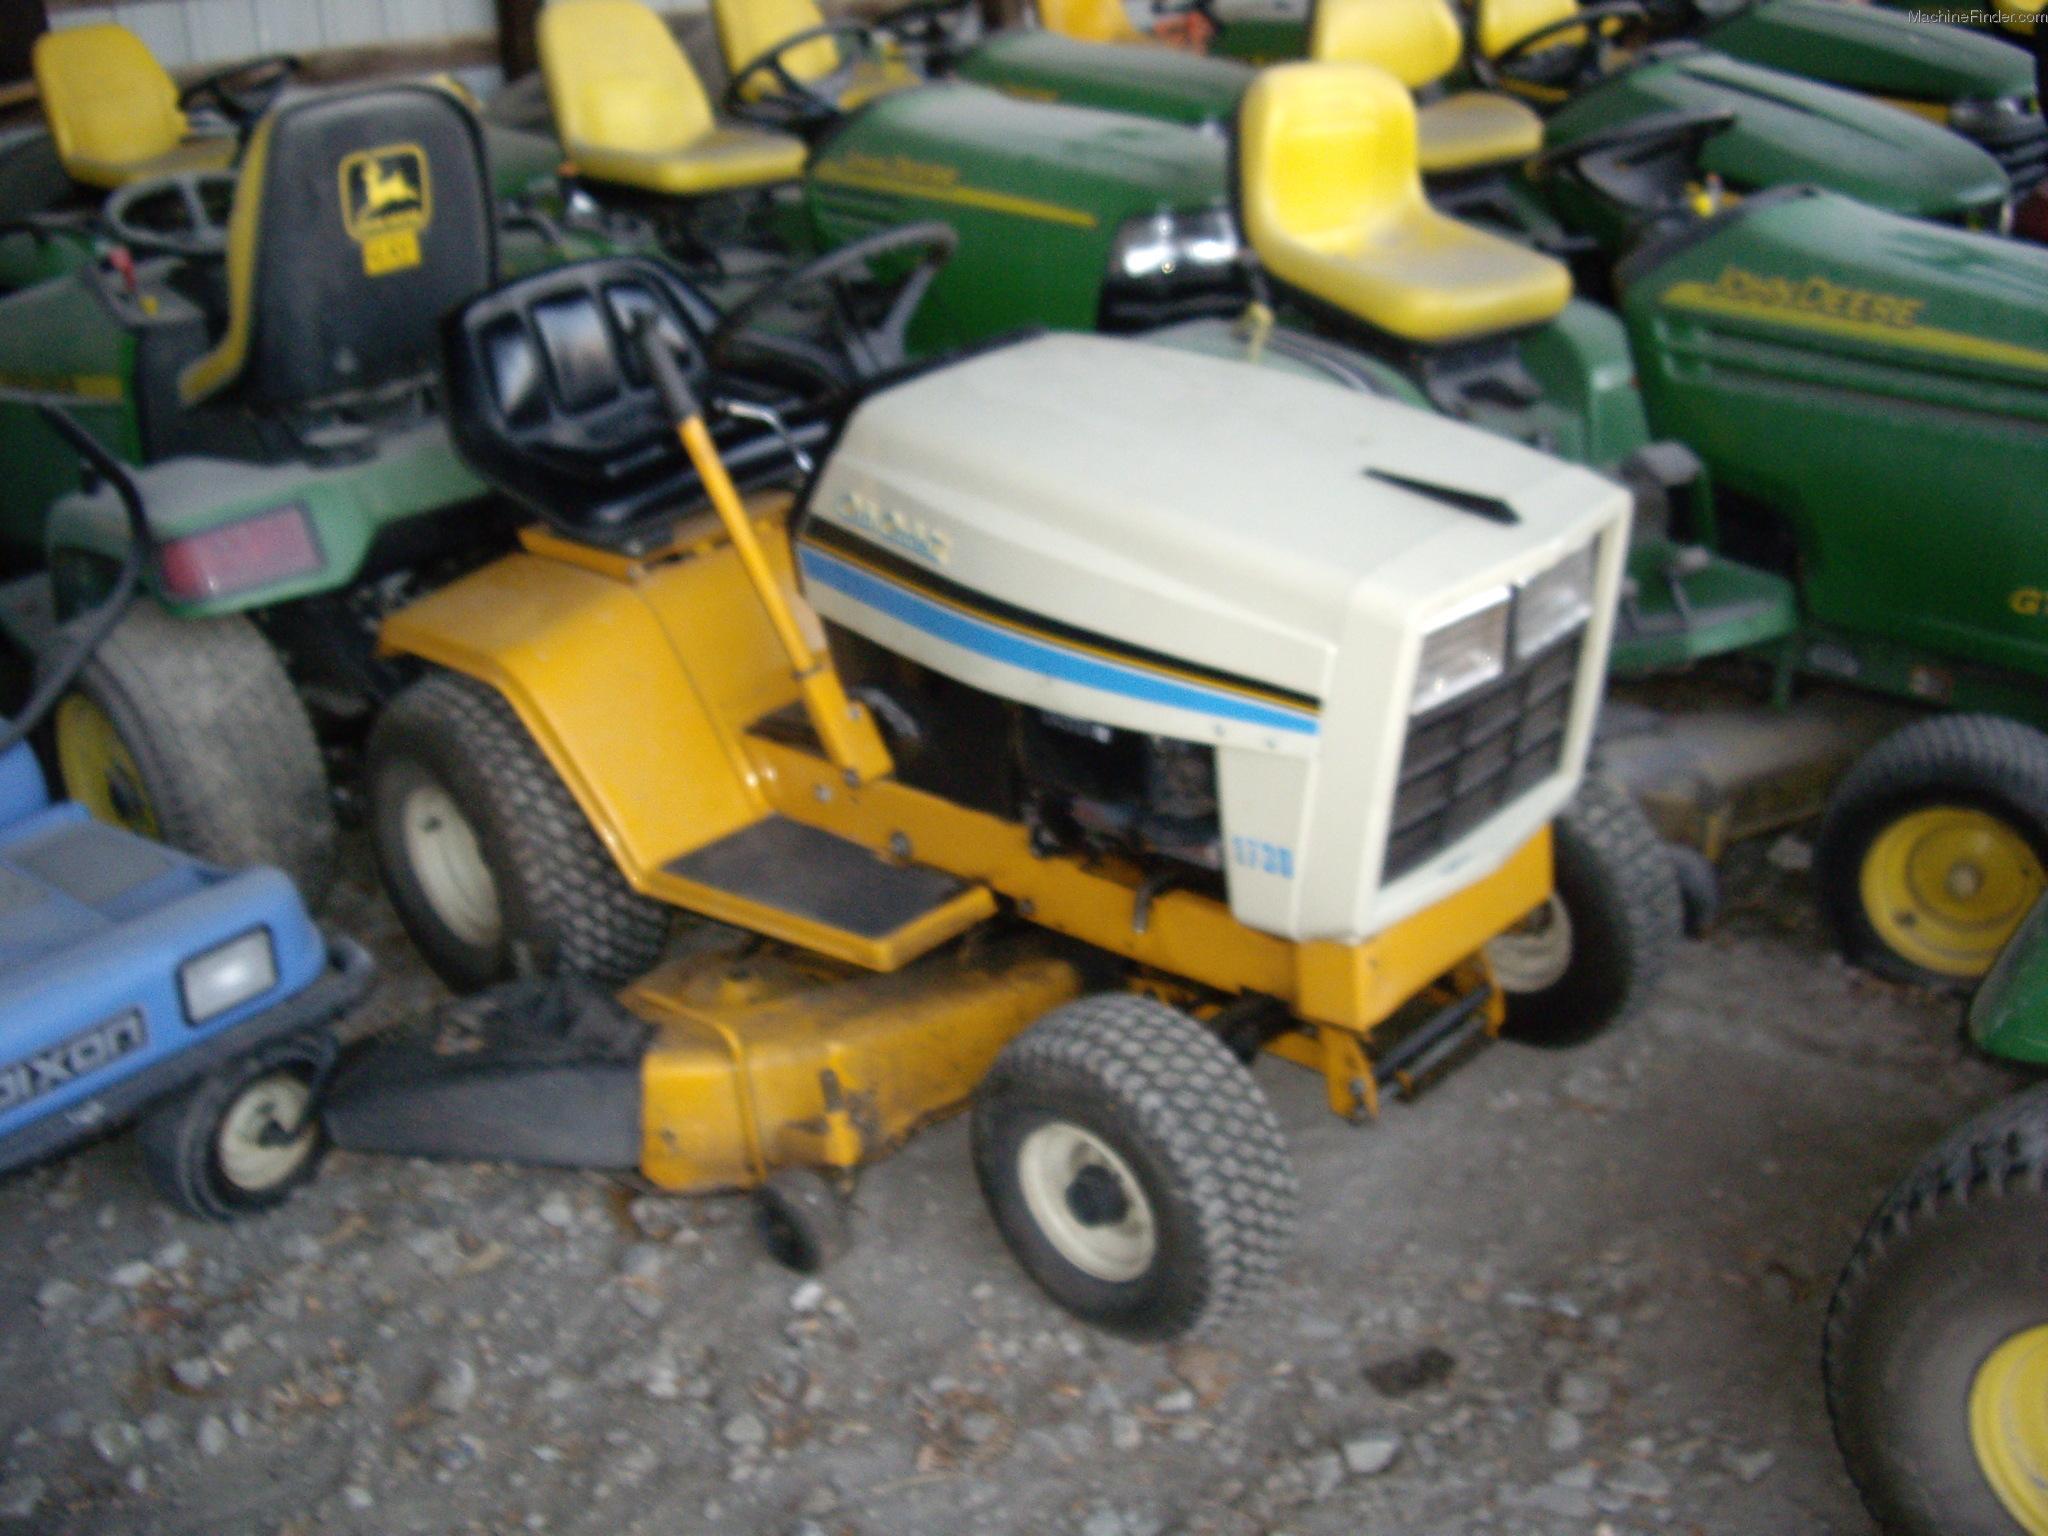 Cub Cadet 169 Lawn Tractor Tractors 1450 Schematic 1730 Machinefinder My News Faq Help Financing Certified